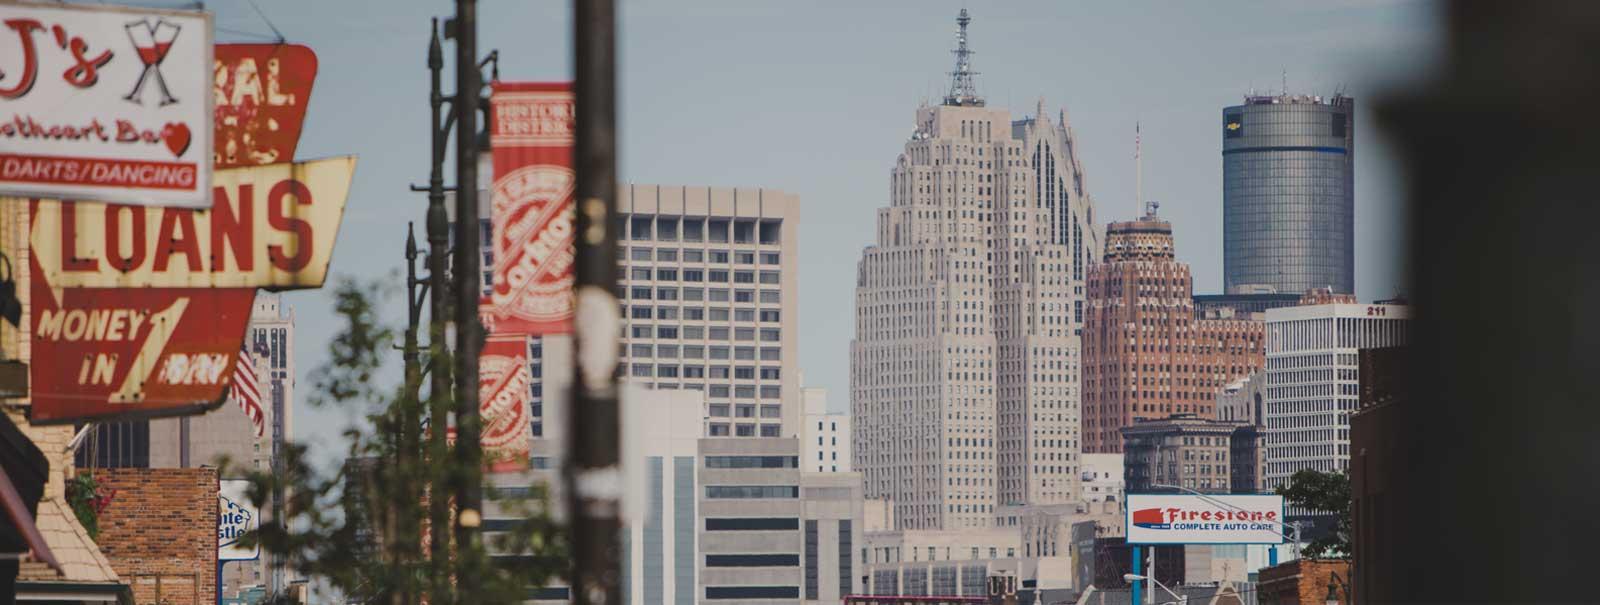 Detroit Lookbook